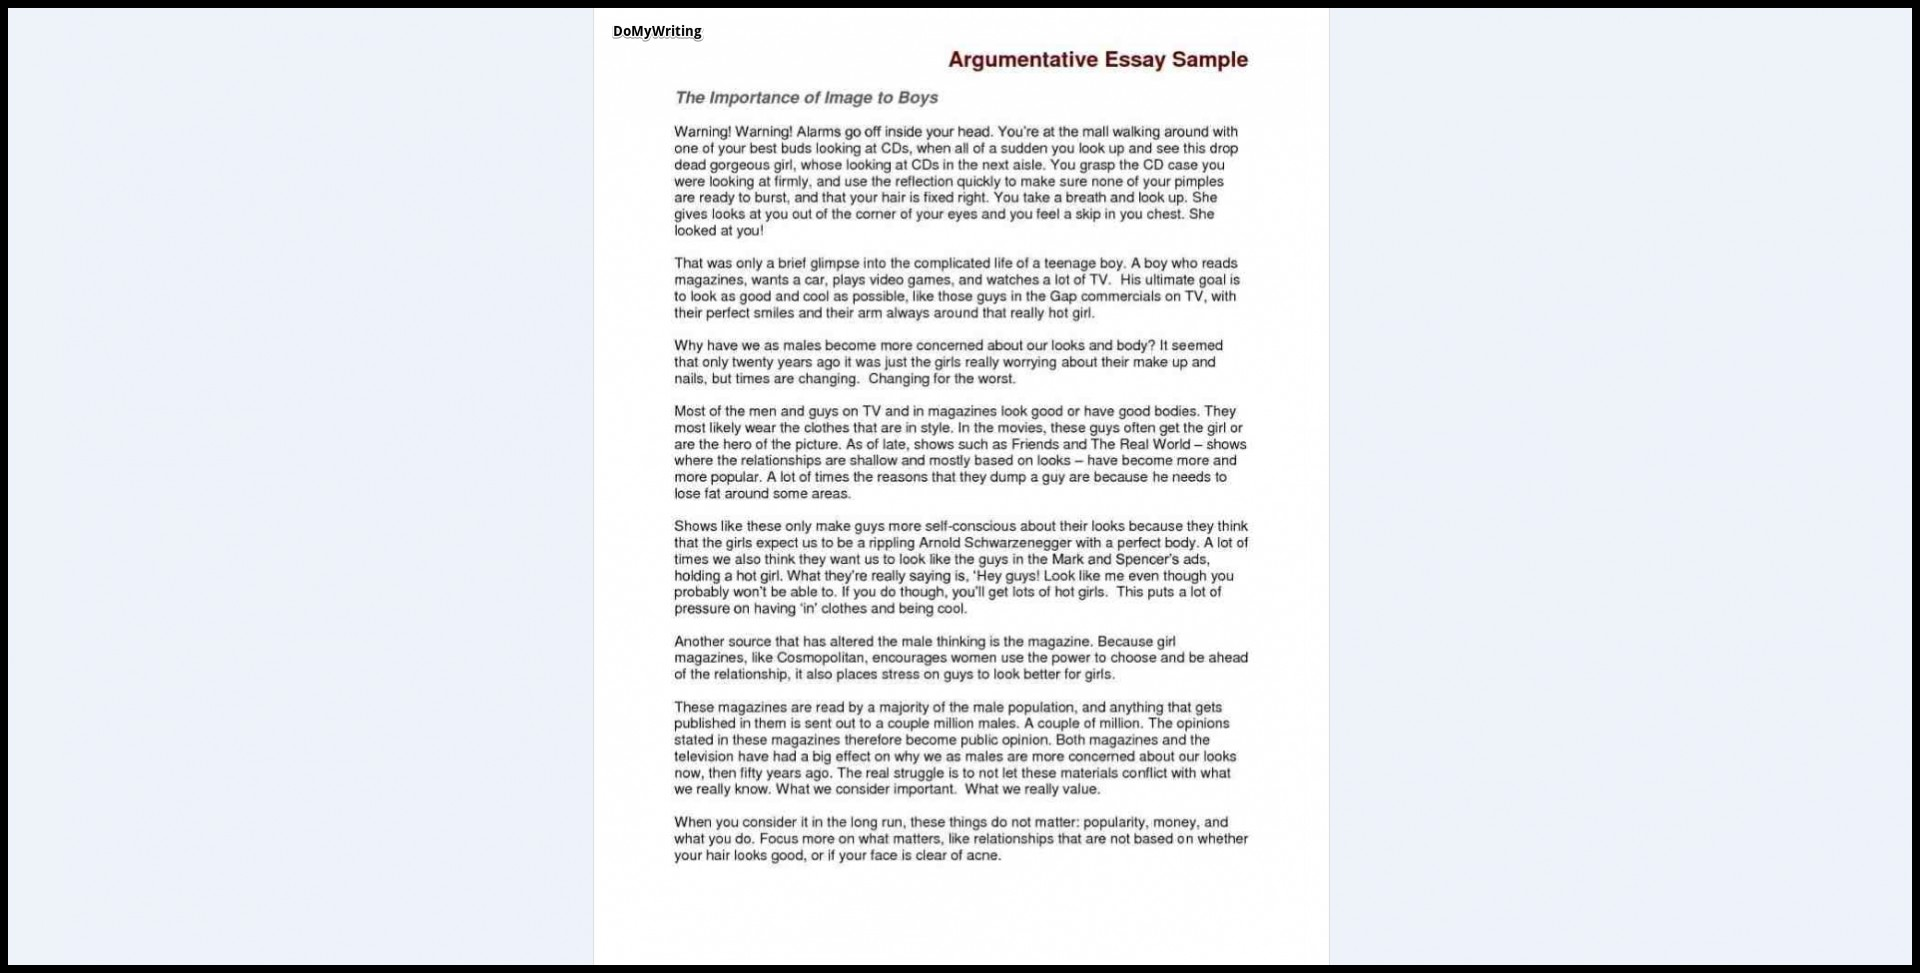 002 Argumentative Essay Sample Example Fascinating Best Topics Uk 2018 1920